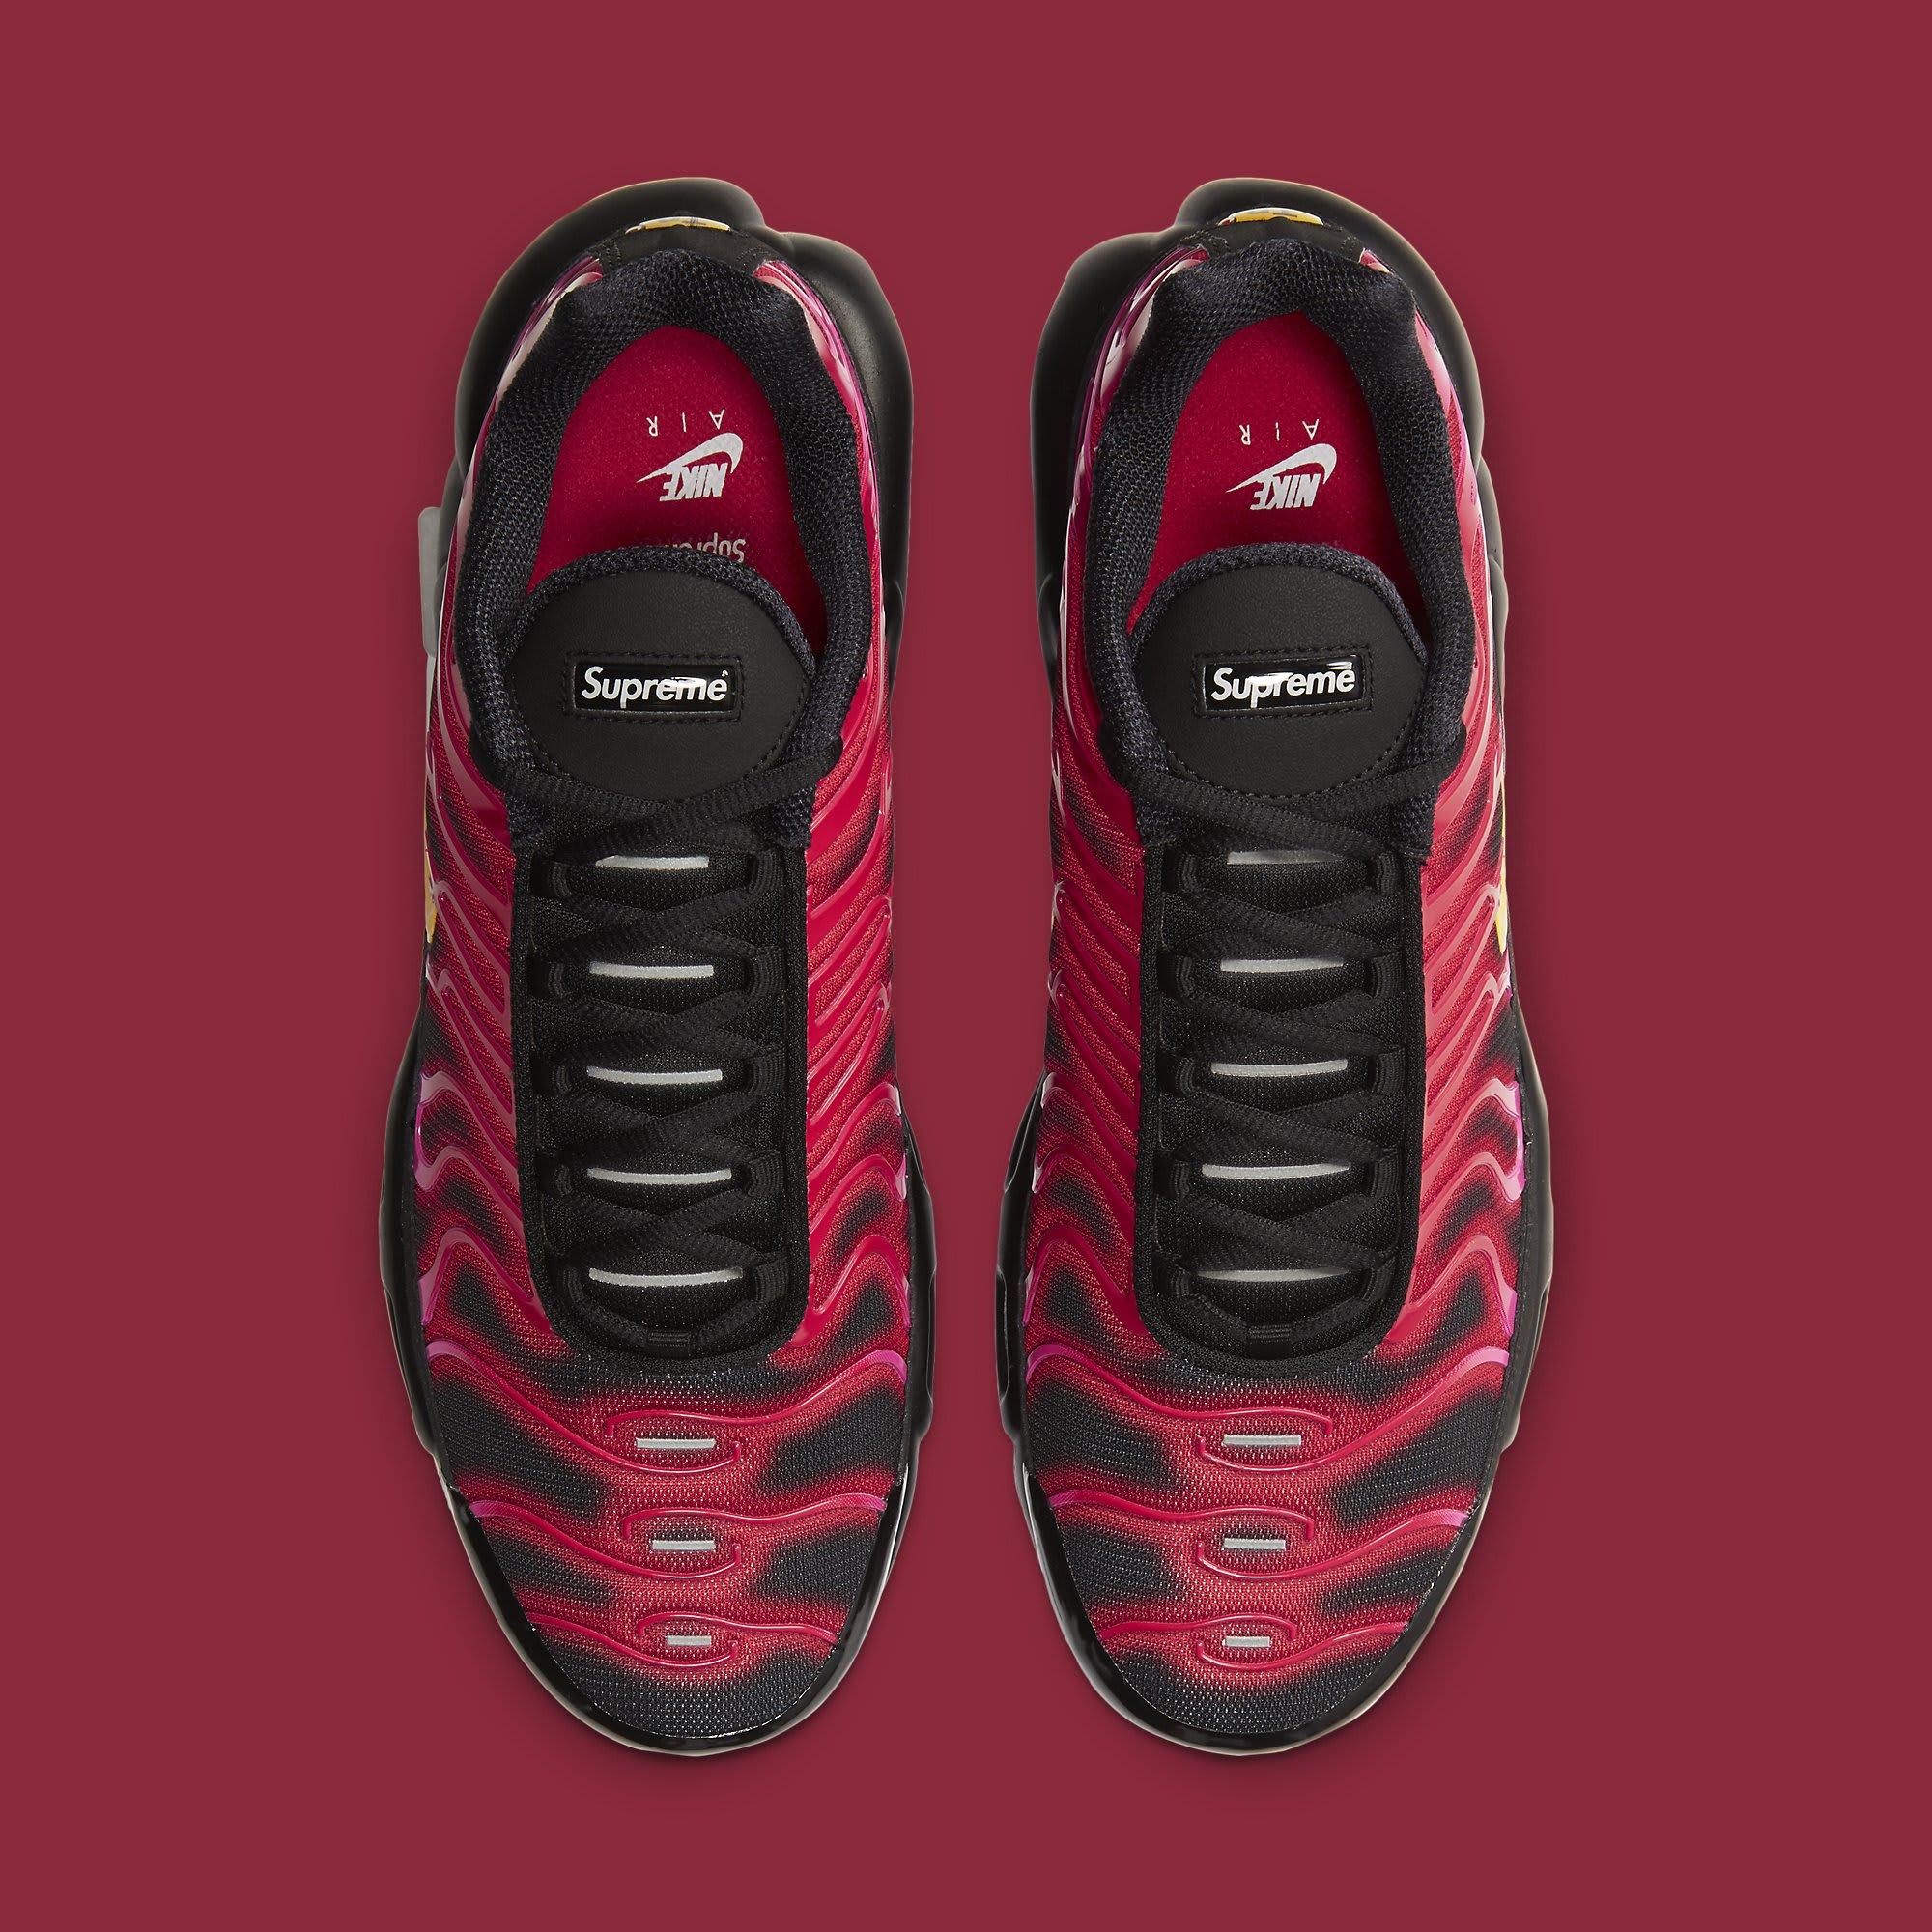 Supreme x Nike Air Max Plus 'Fire Red' DA1472-600 Top